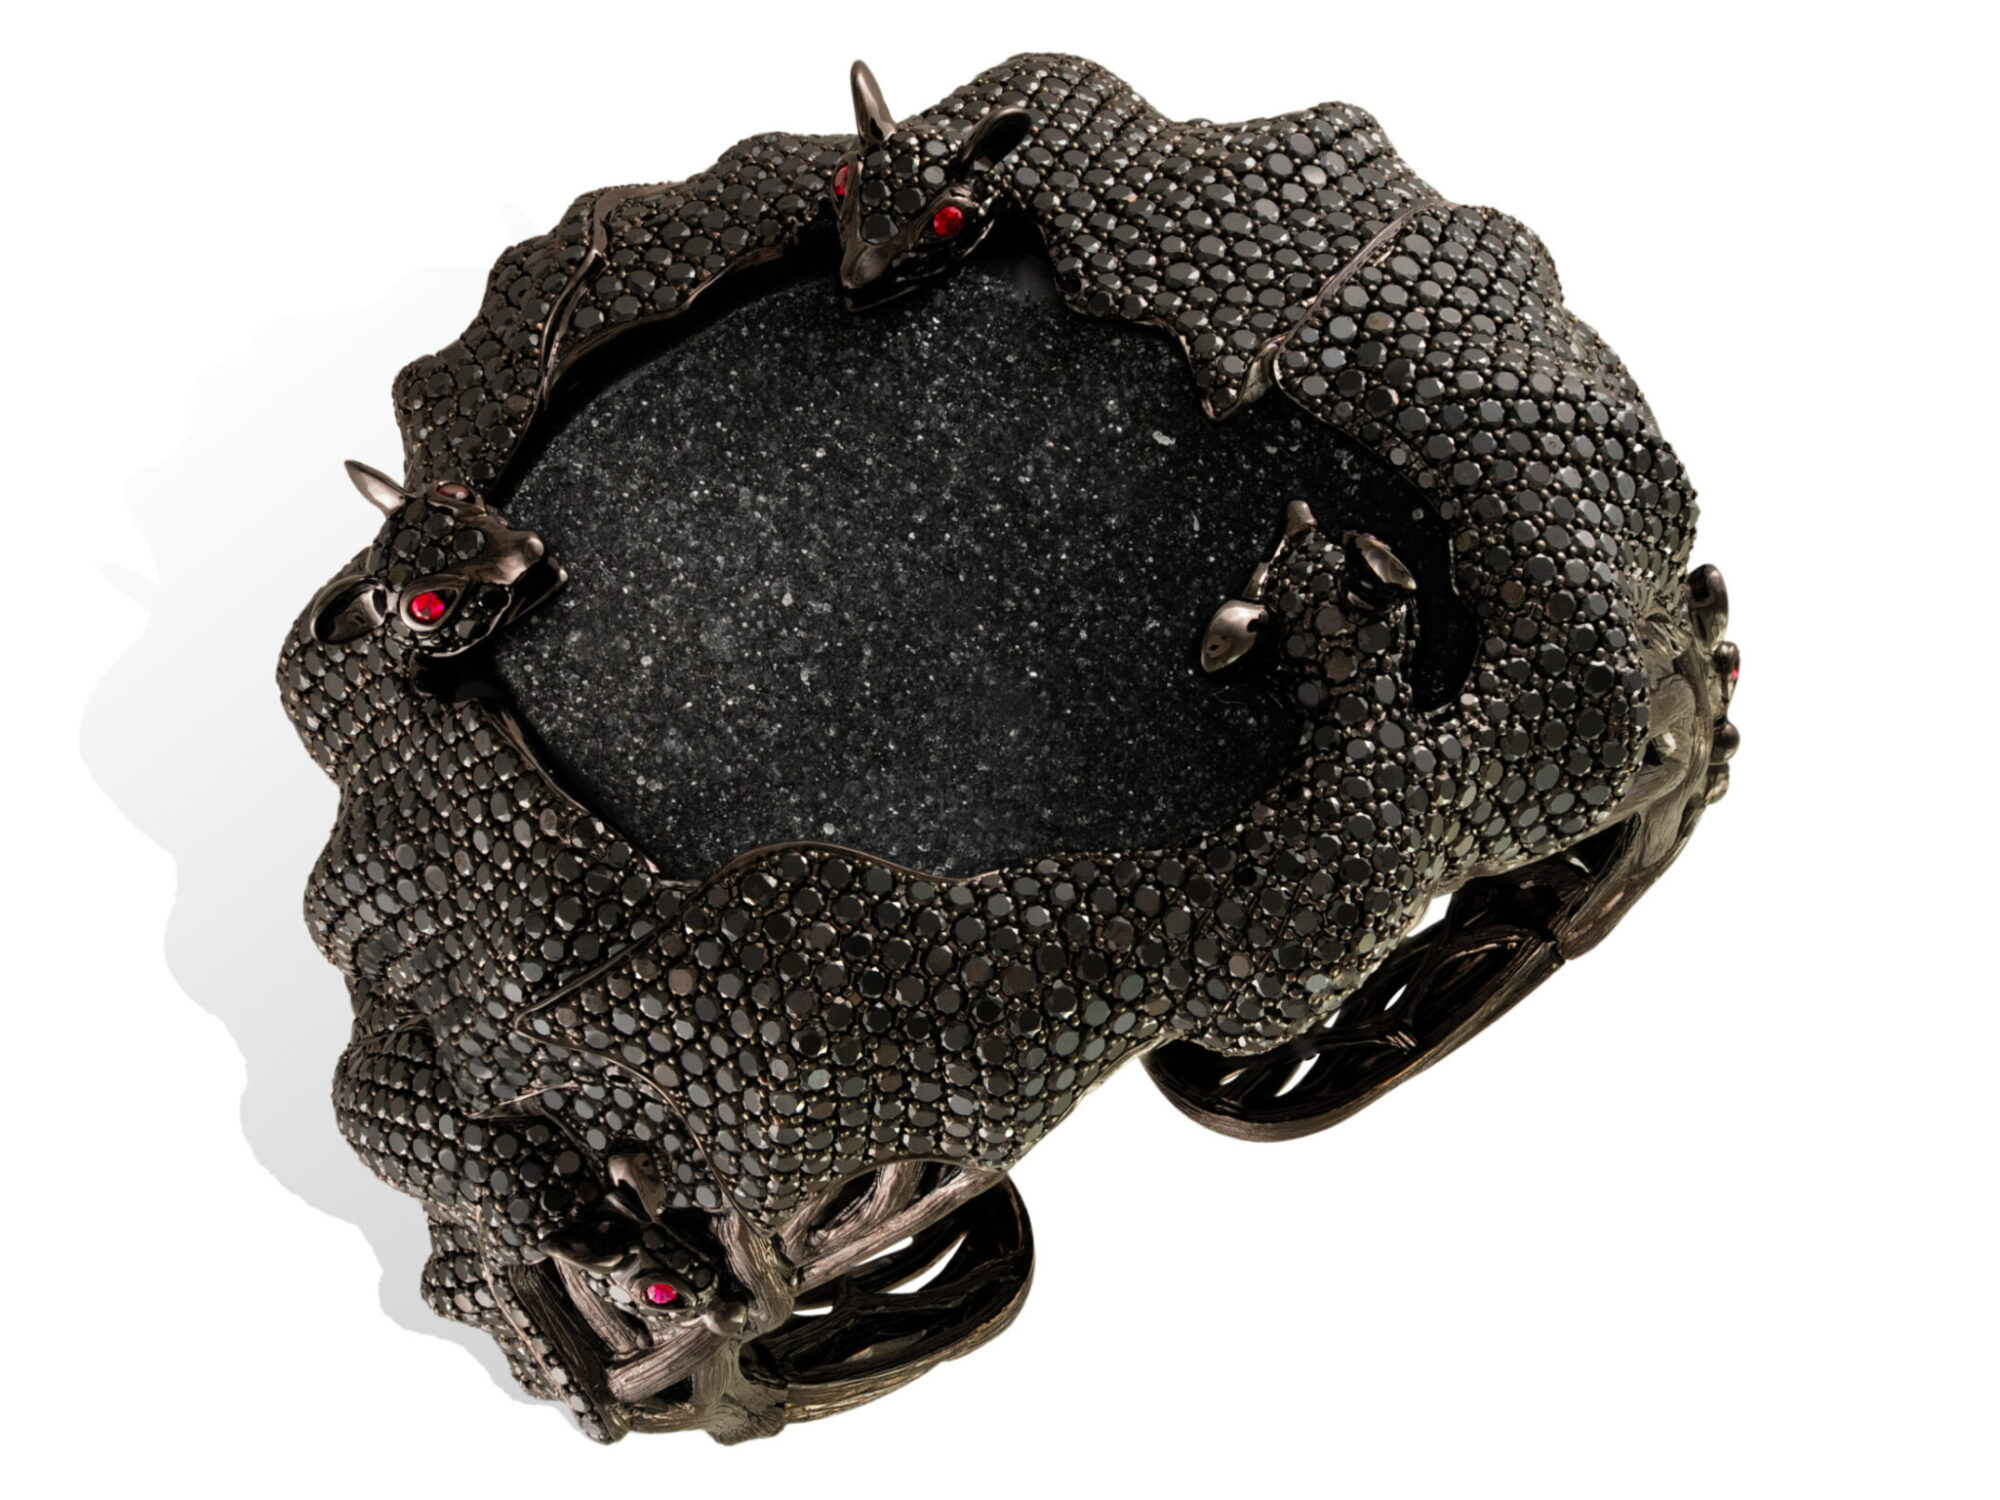 Bracelet 18 K OR / black rhodium gold 158.61 grs, 10 rubies 0.24 ct, 1966 DTS / black diamonds 42.52 cts, 1 druzy agate 44.58 grs